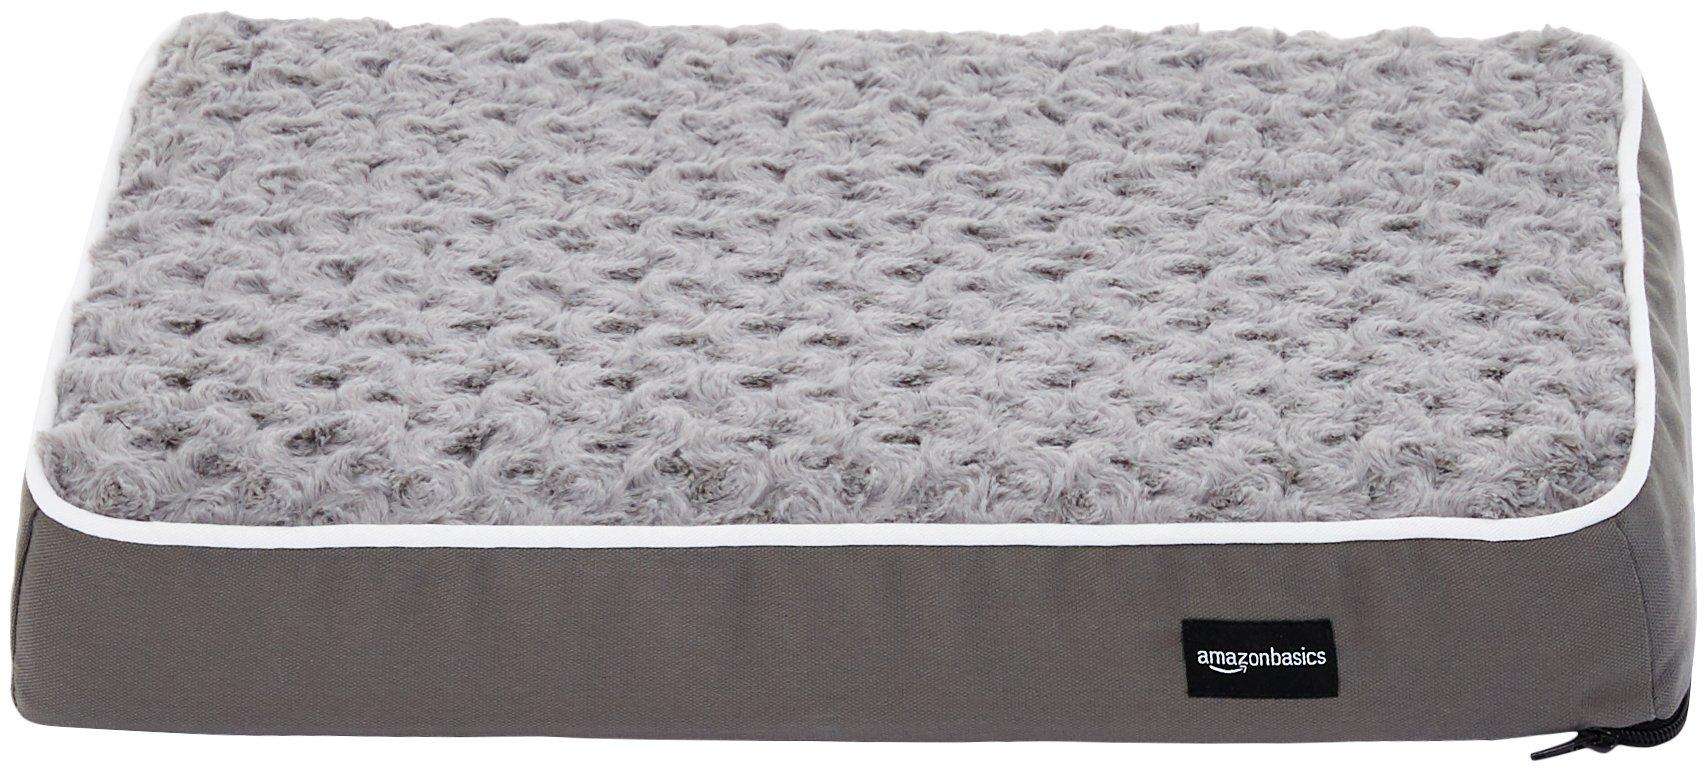 AmazonBasics Ergonomic Foam Pet Bed For Cats or Dogs 1